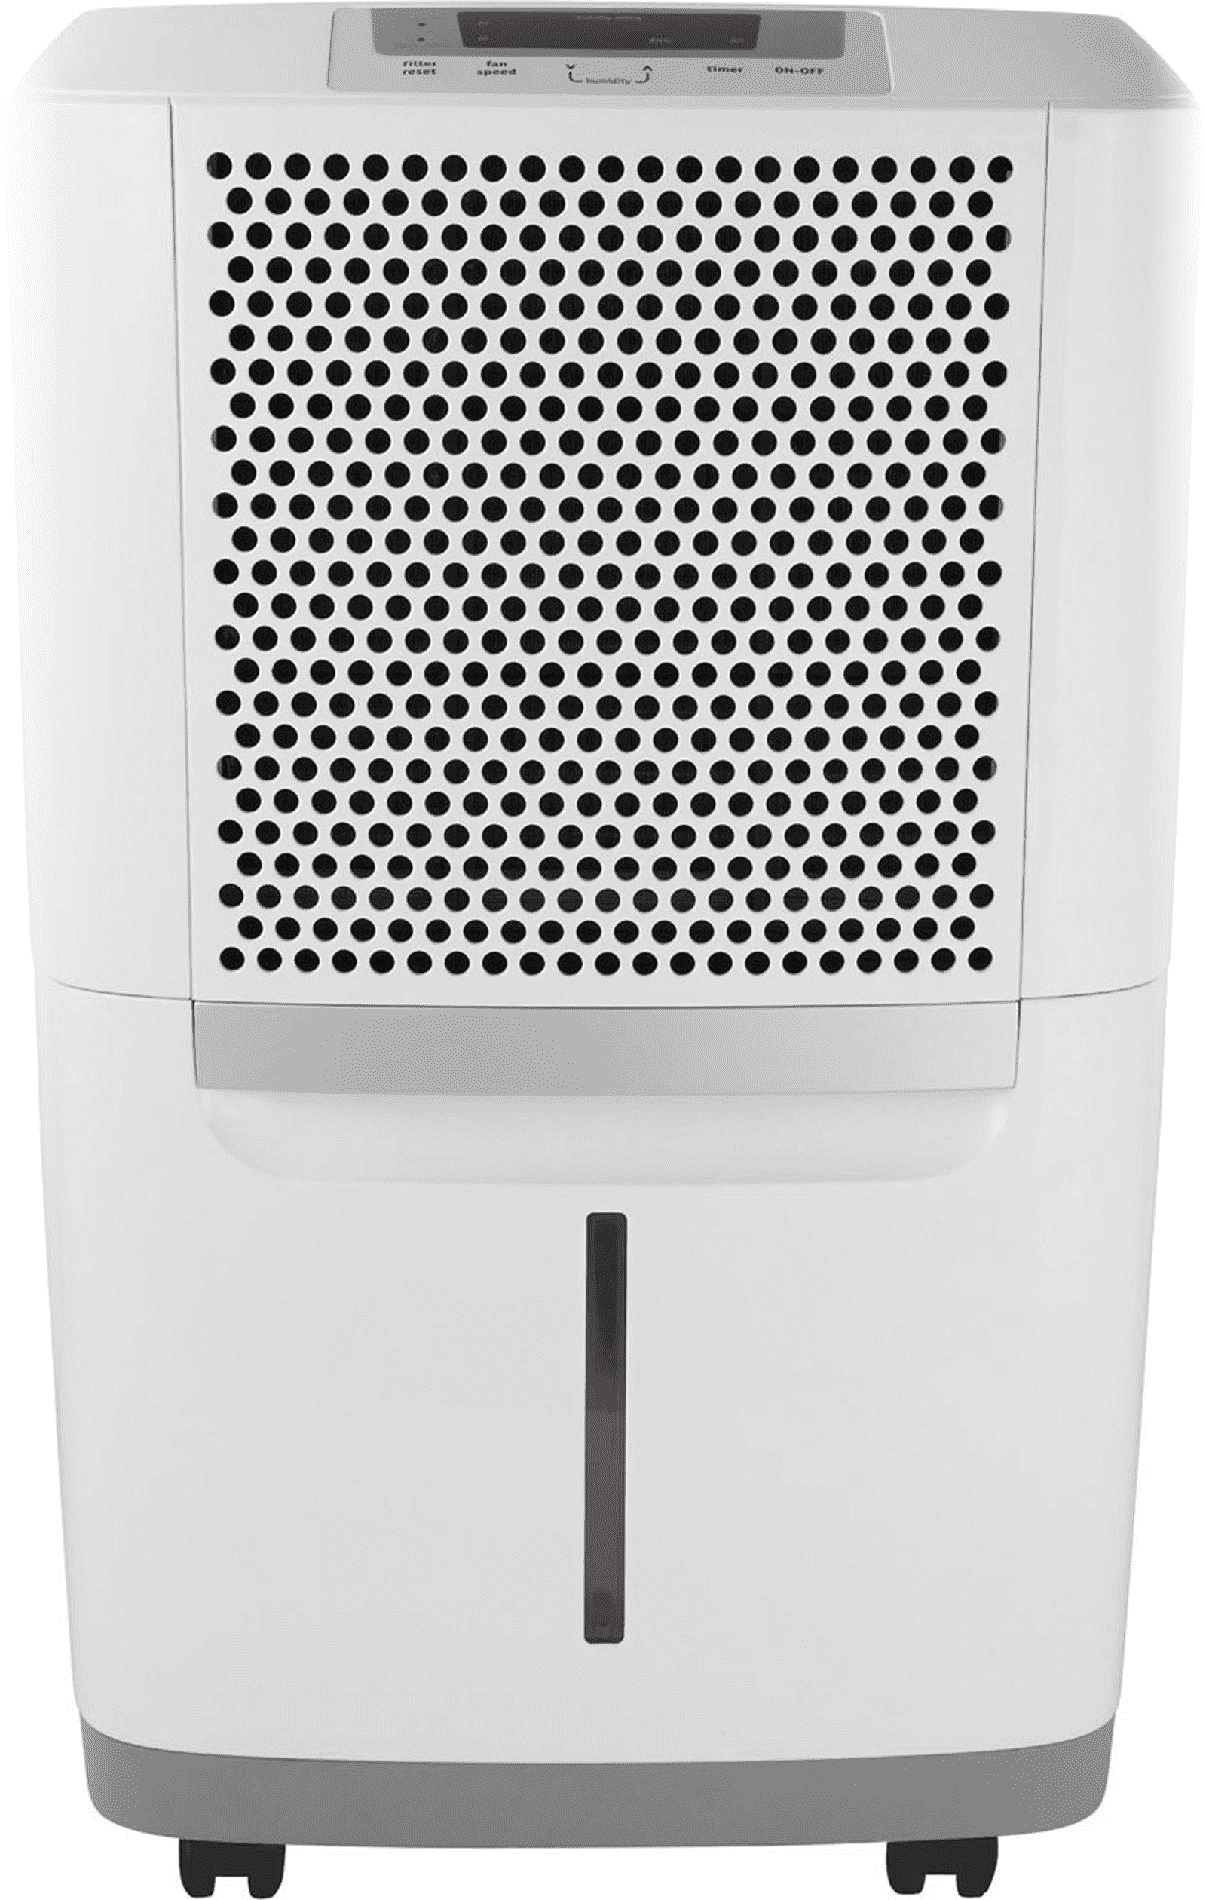 Frigidaire FAD704DWD 70 Pint Dehumidifier ALMO4260